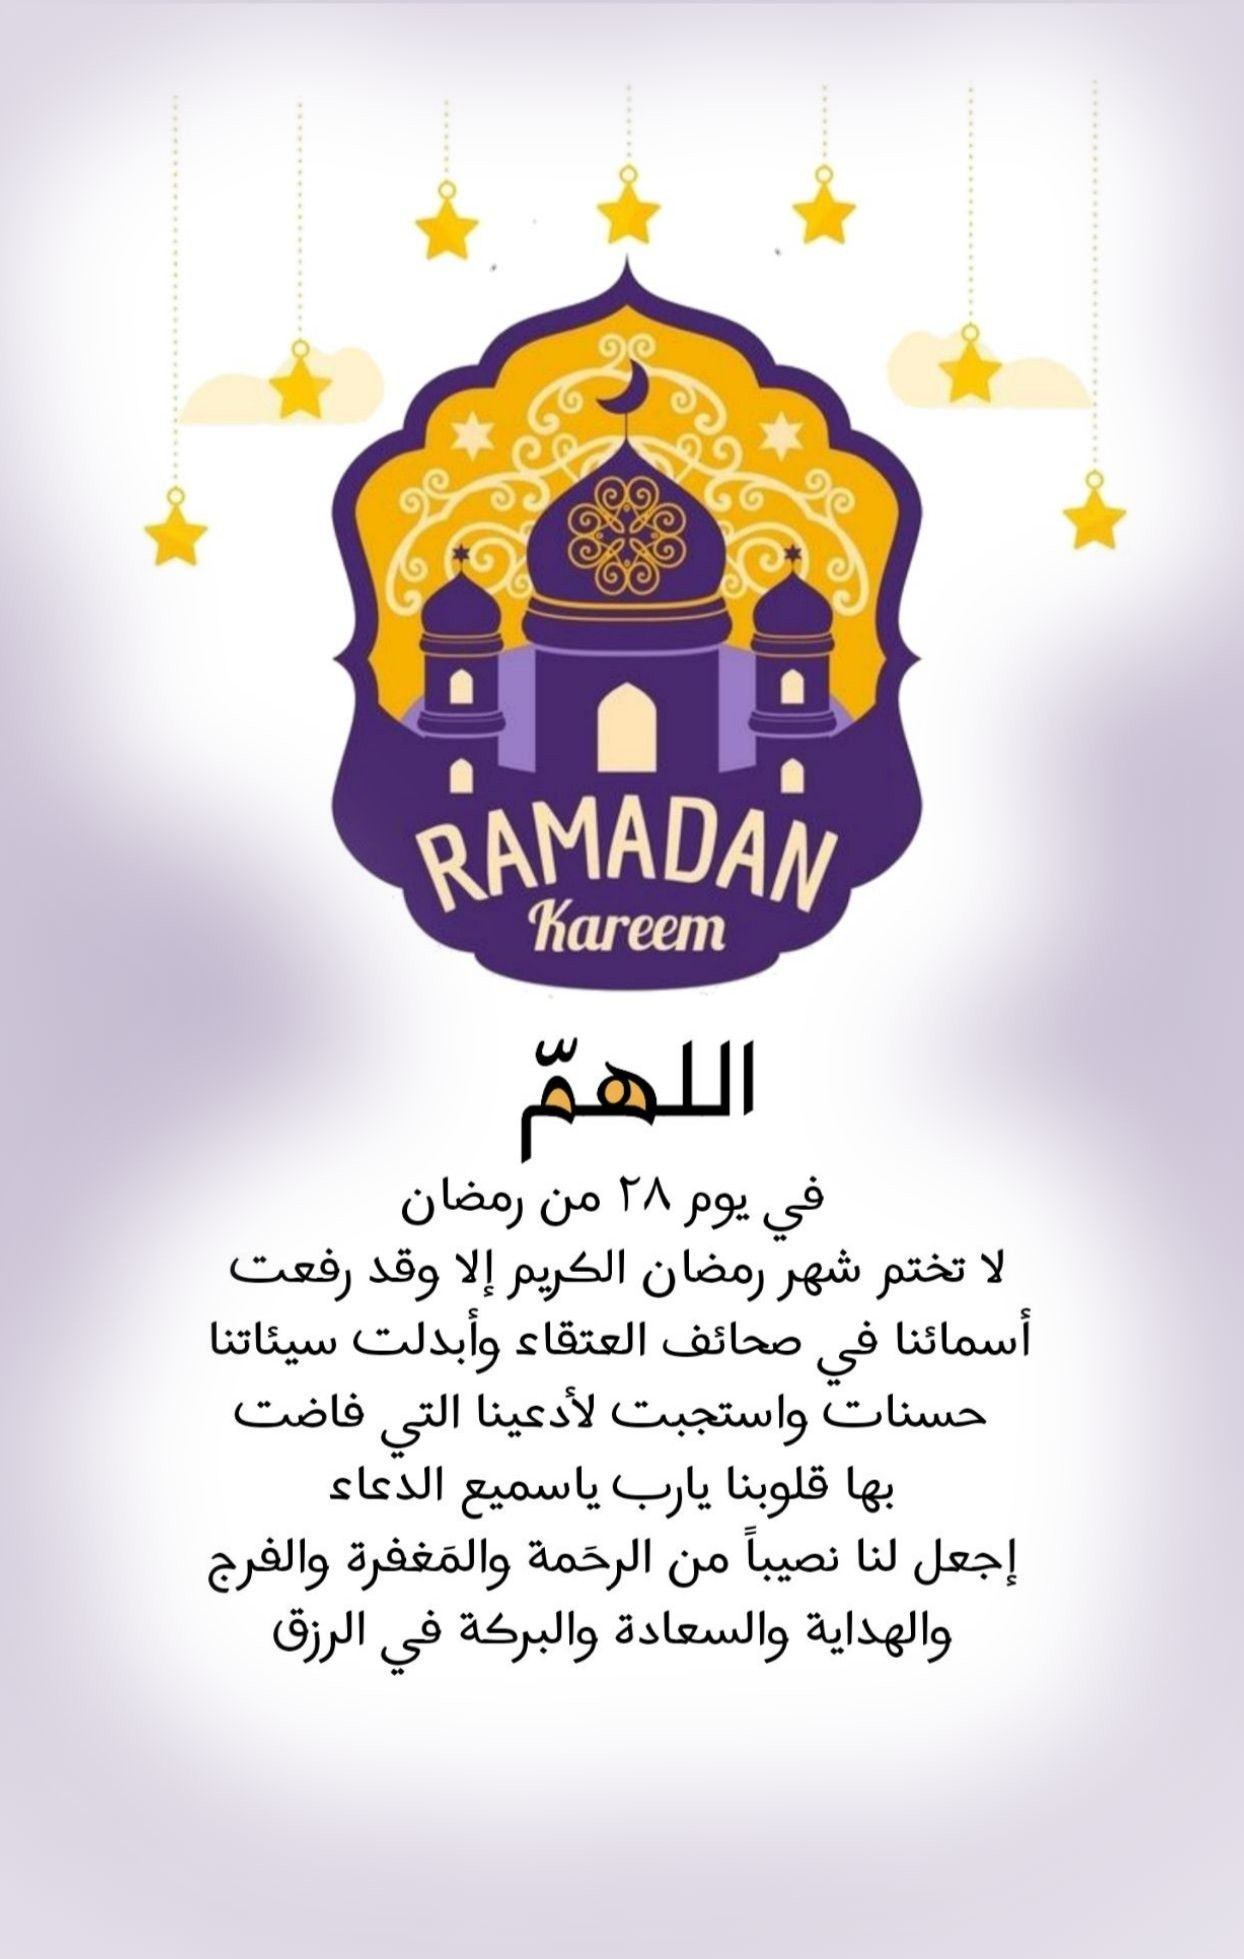 Pin By Ibrahim Abdelnour On Ramadan 2021 In 2021 Ramadan Day Ramadan Ramadan Kareem